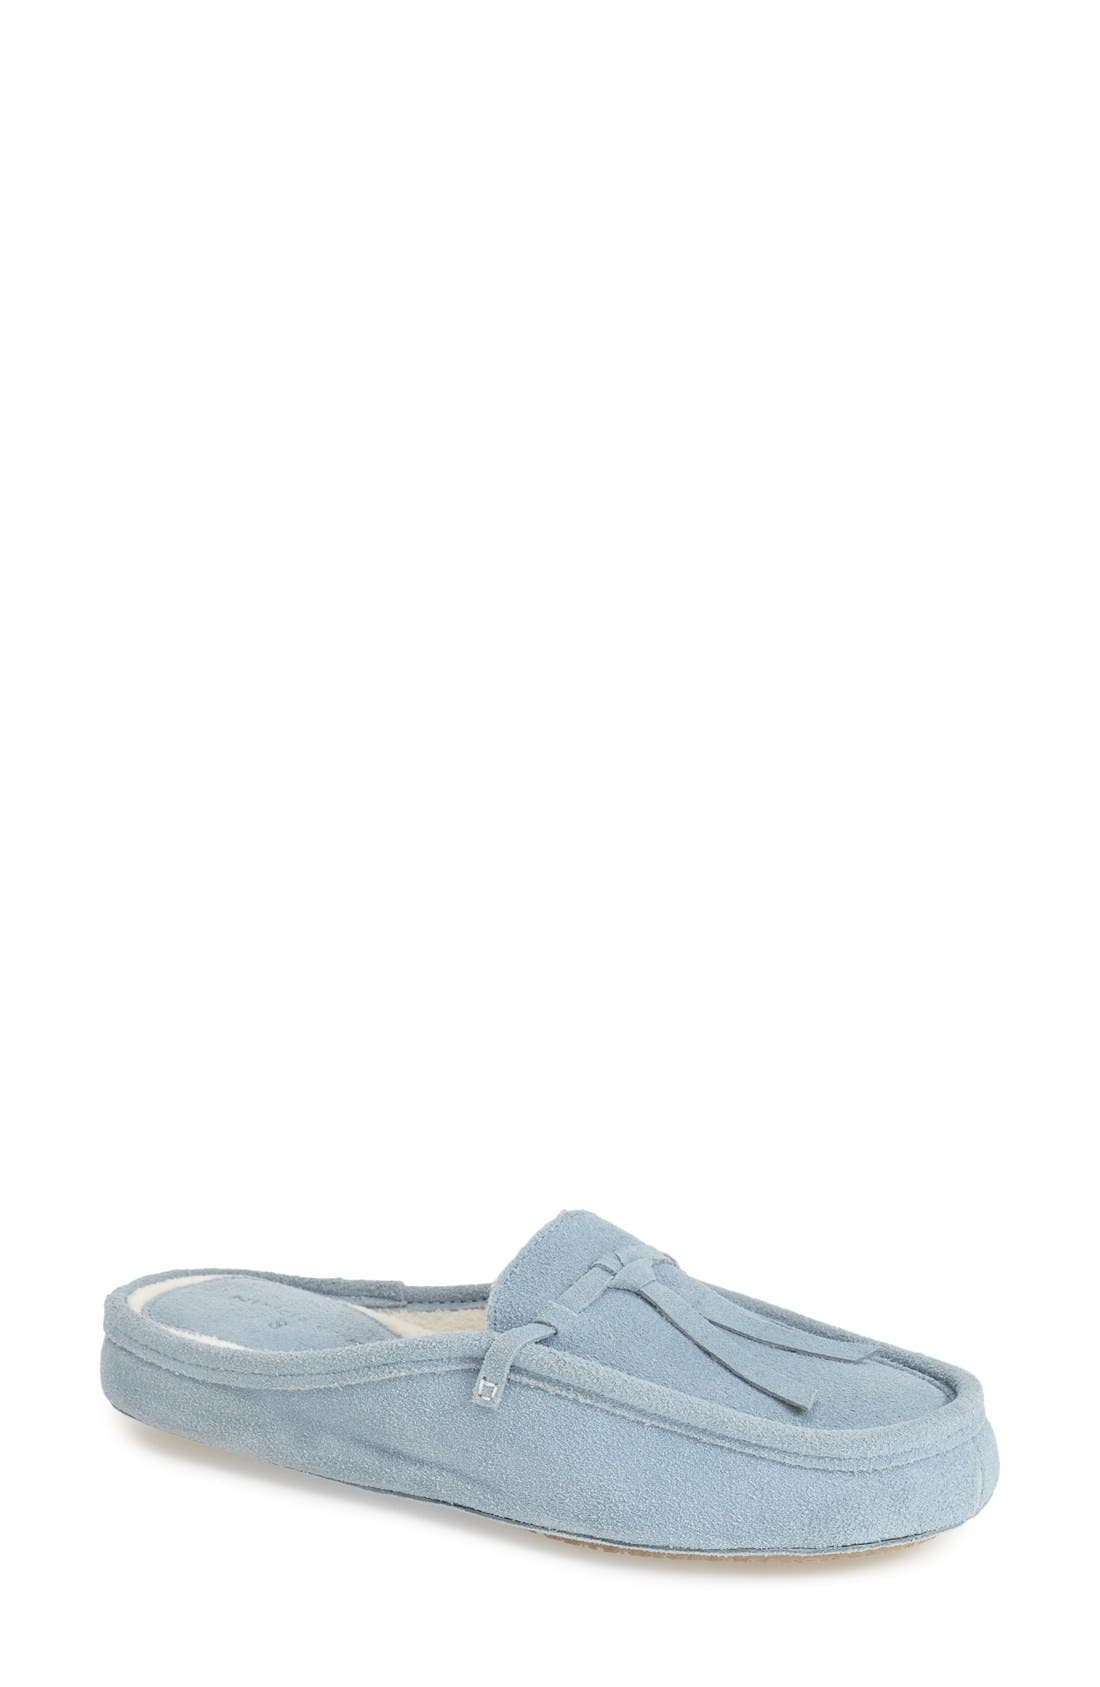 patriciagreen 'Greenwich' Mule Slipper,                             Main thumbnail 1, color,                             Light Blue Suede